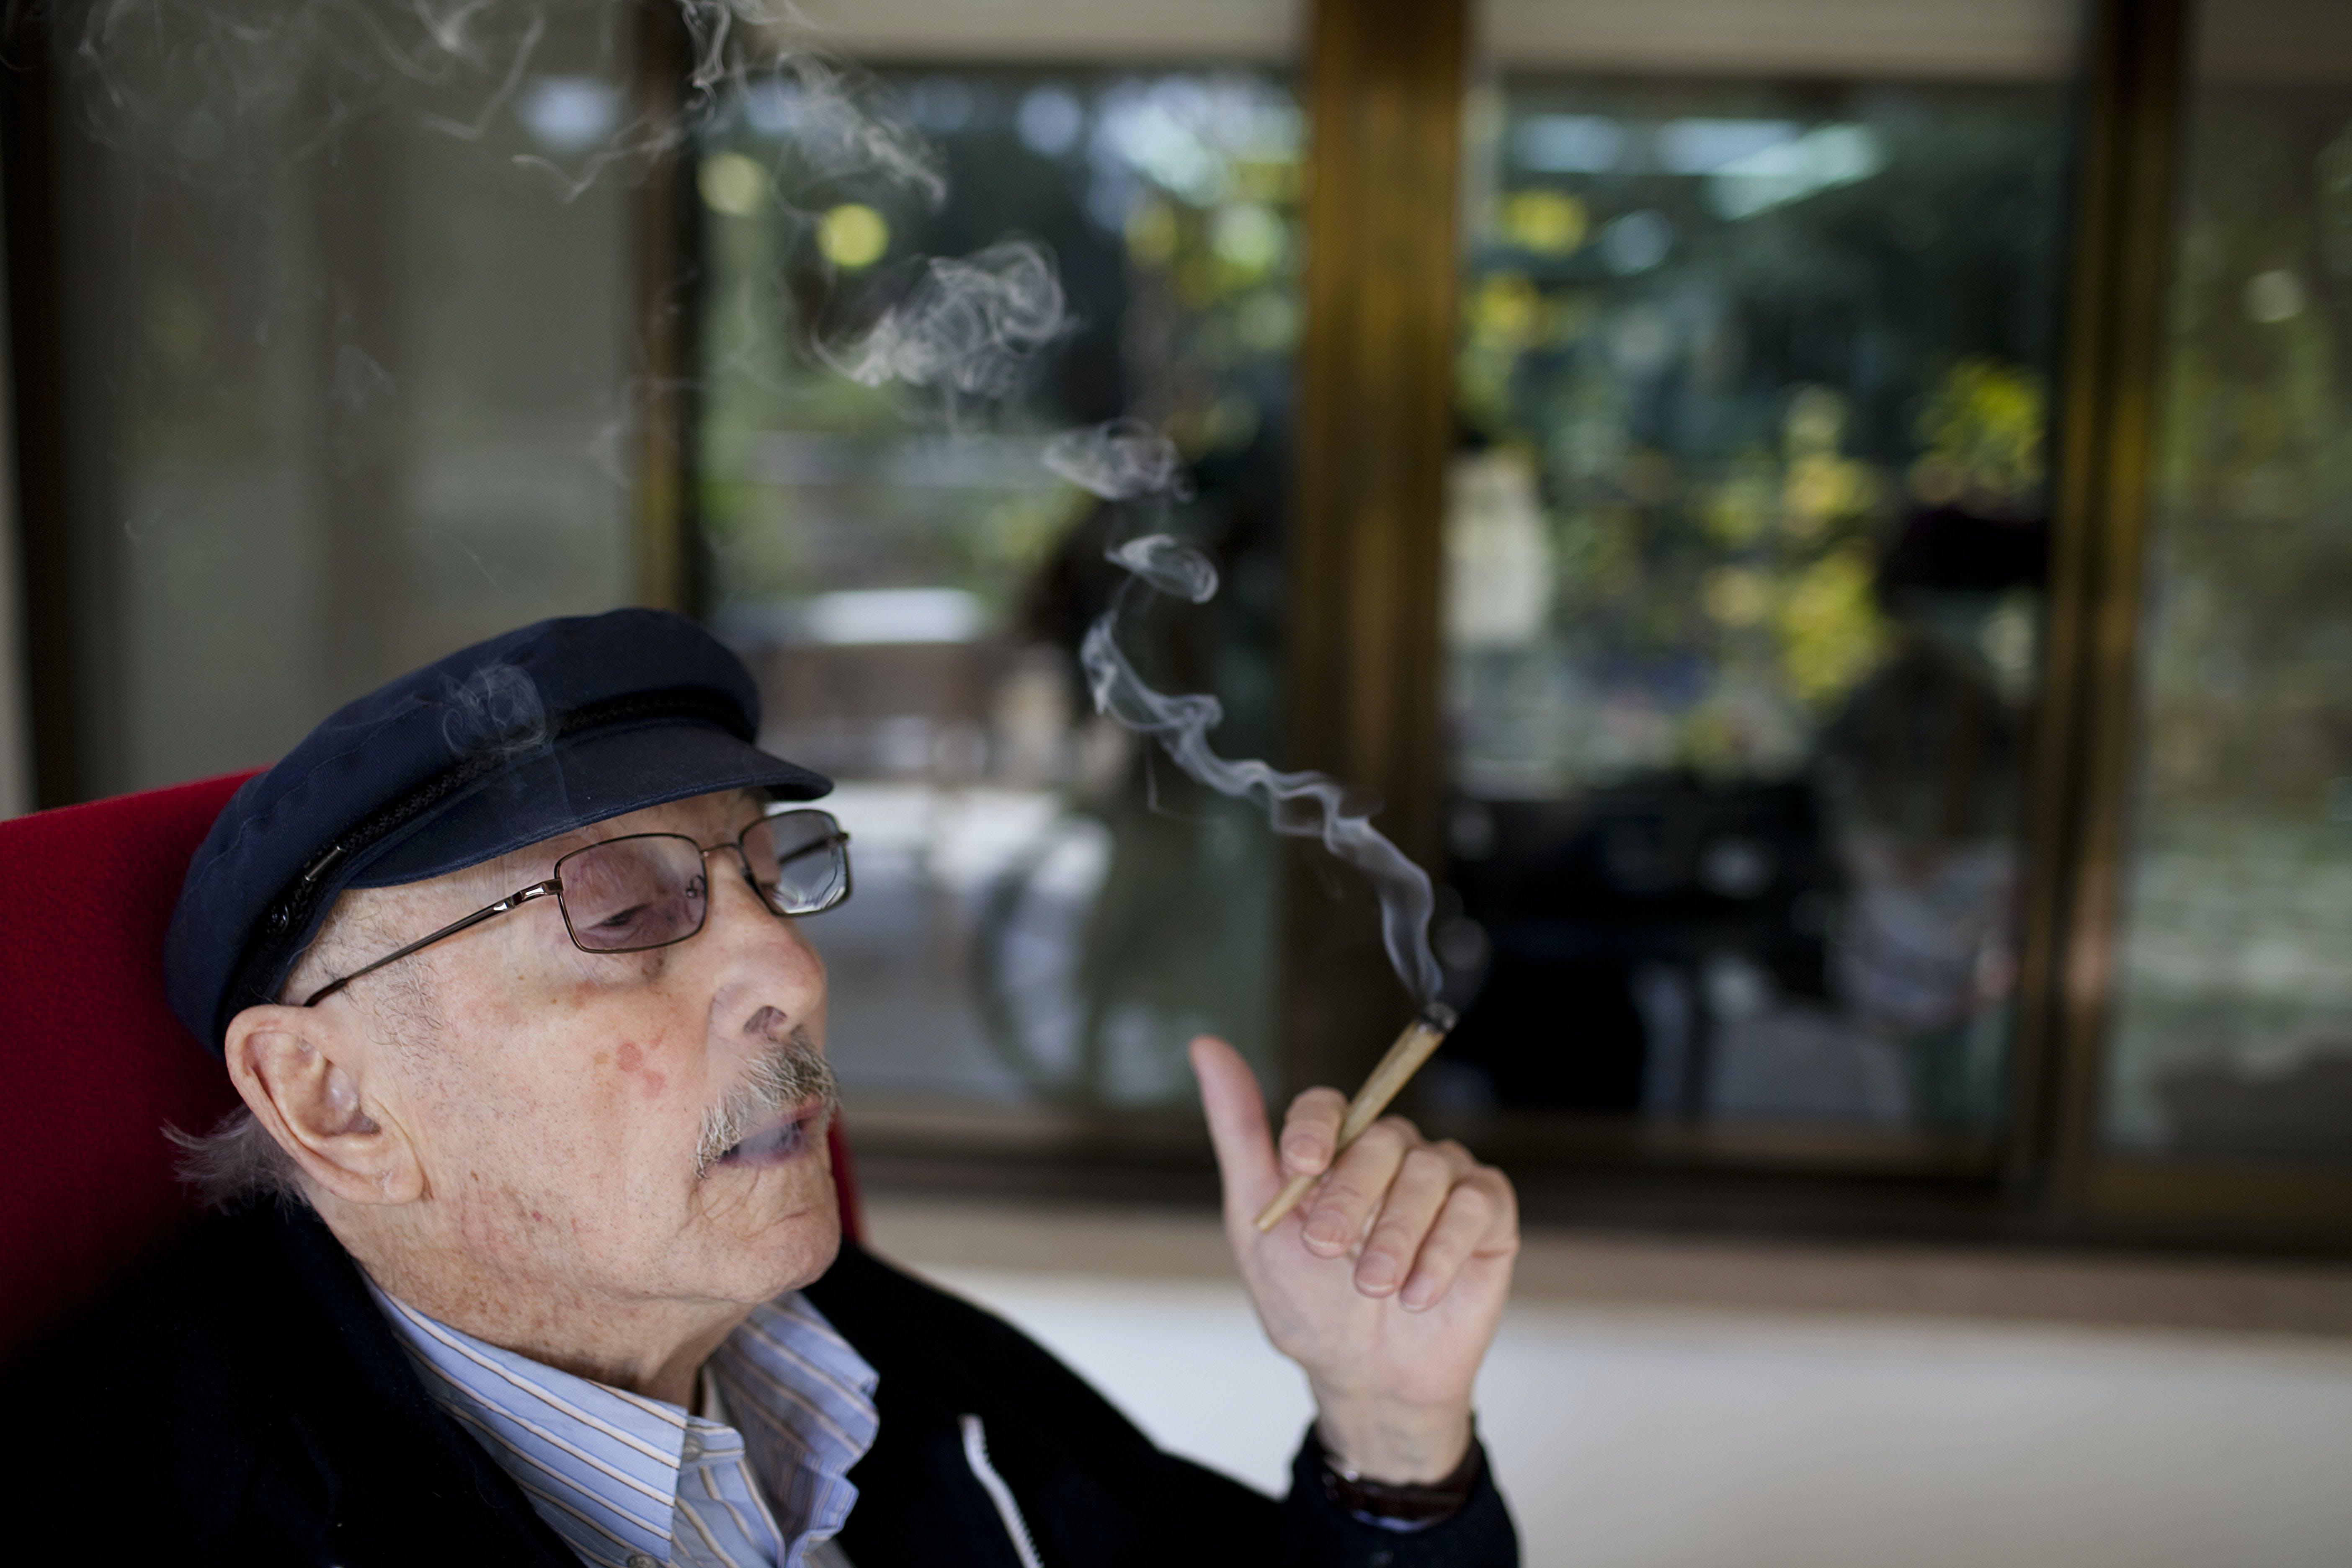 Israeli marijuana researchers to open first U.S. clinic in Laguna Woods body Orange County, California Gets the First Israeli Cannabis Clinic For Seniors